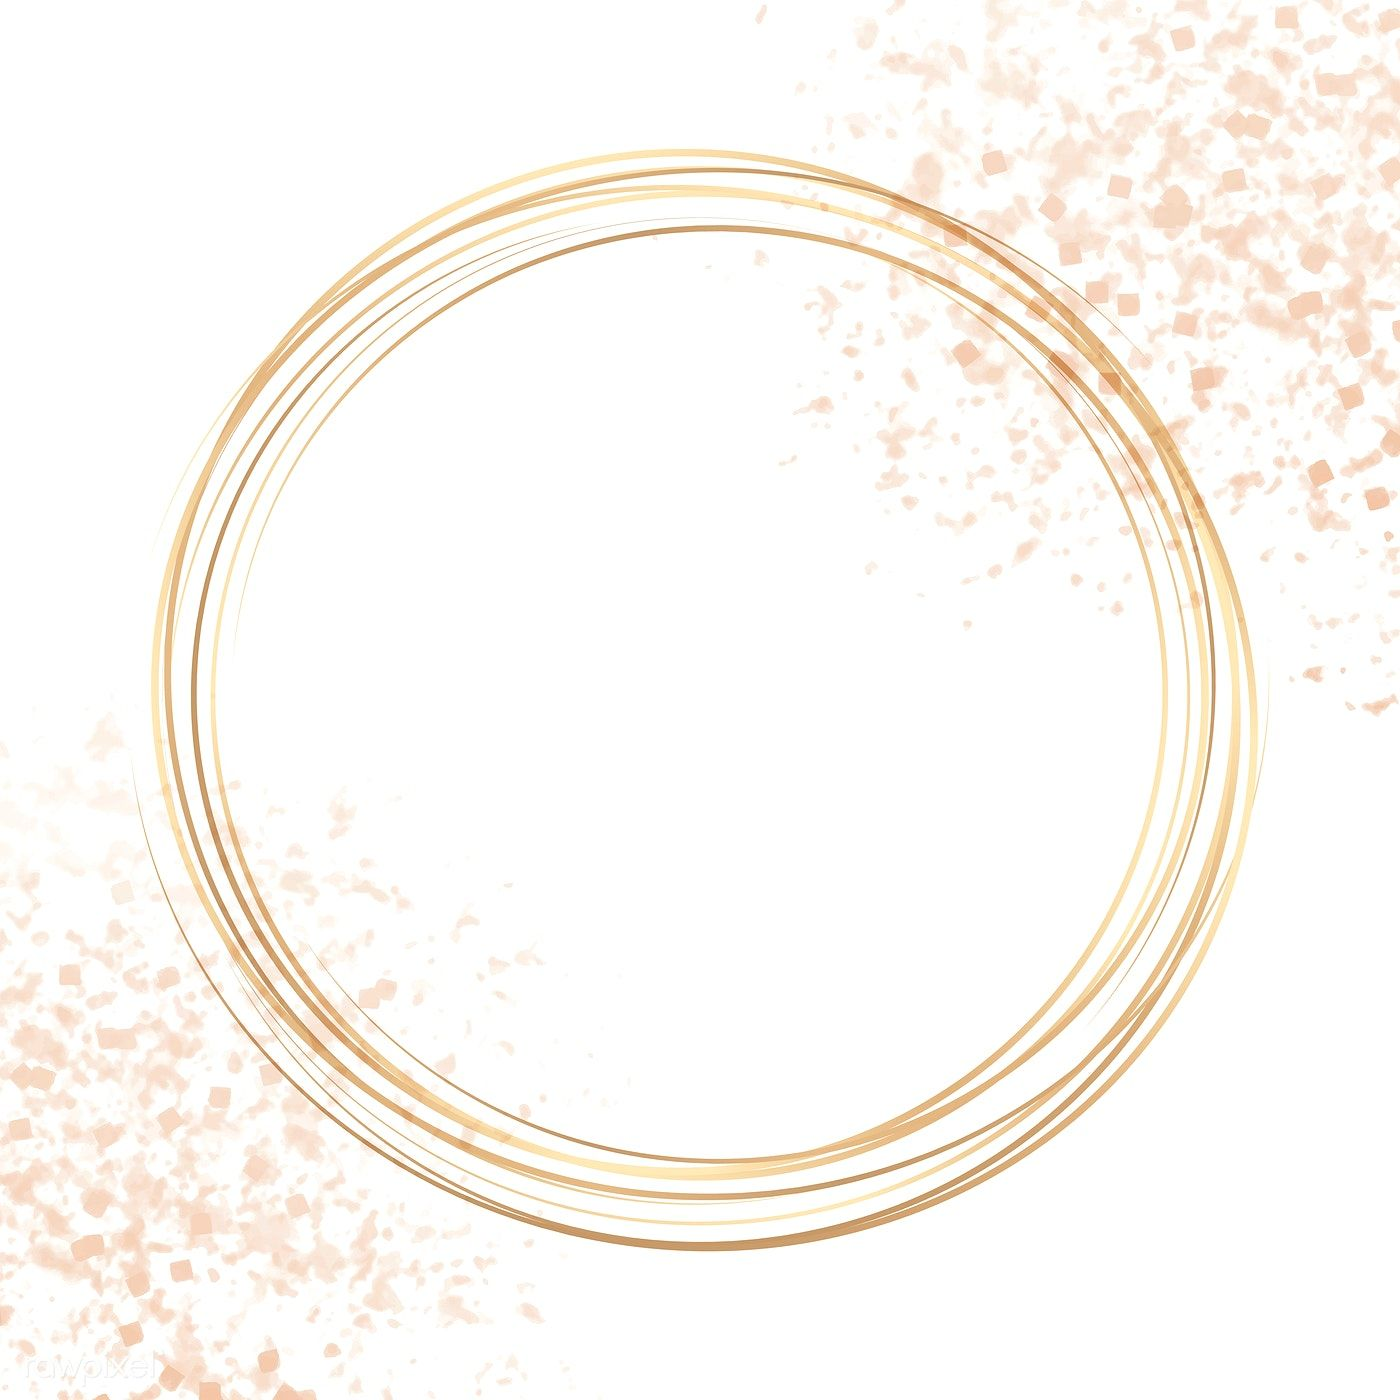 Download Premium Vector Of Gold Circle Frame On A Pastel Pink And Purple Logo Maquiagem Logotipo De Loja Logotipo Salao De Beleza